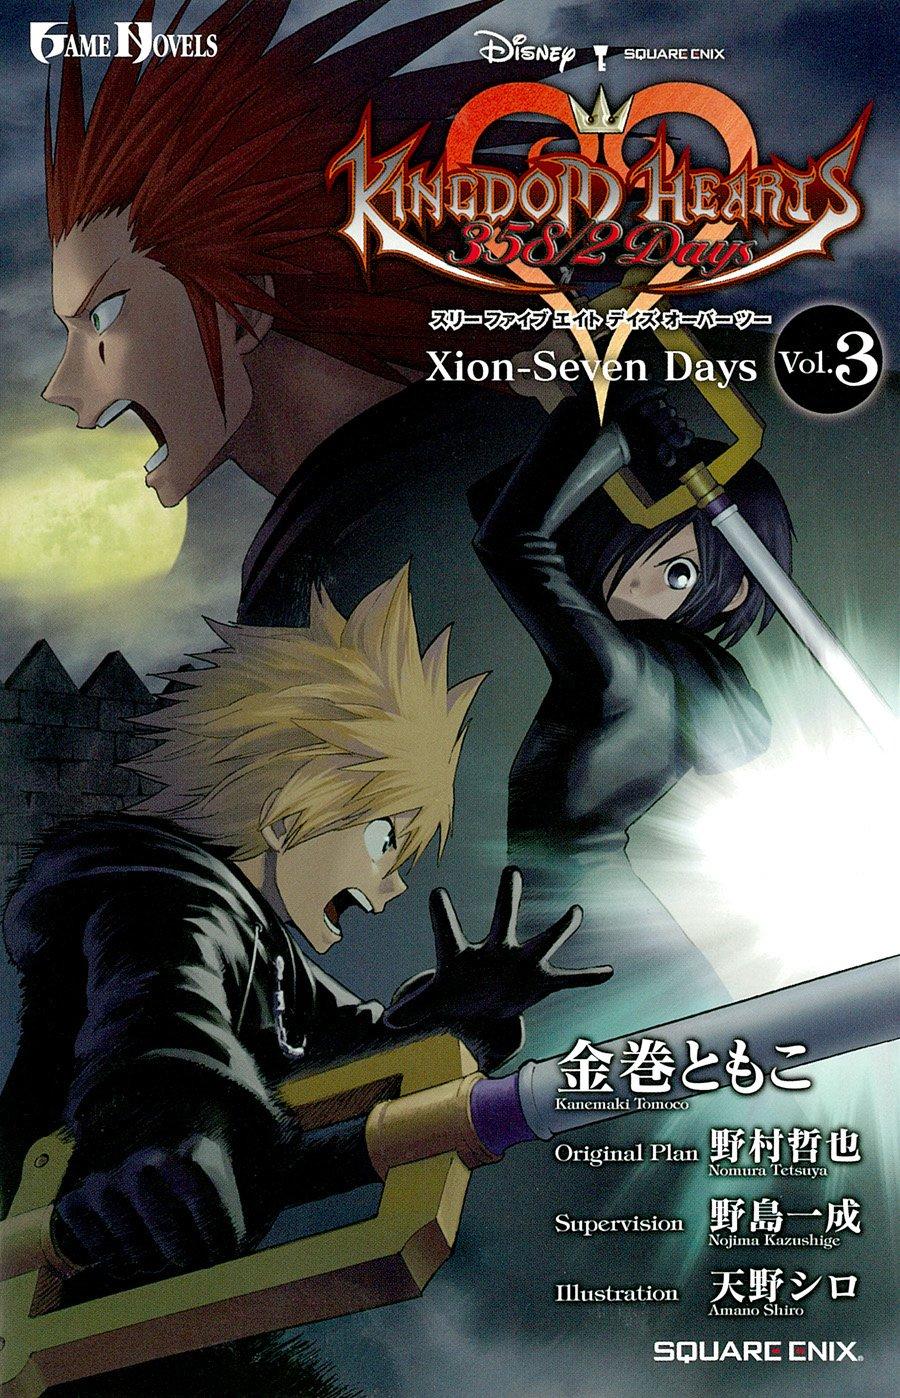 Read Online Kingdom Hearts 358/2 Days Vol. 3: Xion-Seven Days (Japanese Import) pdf epub